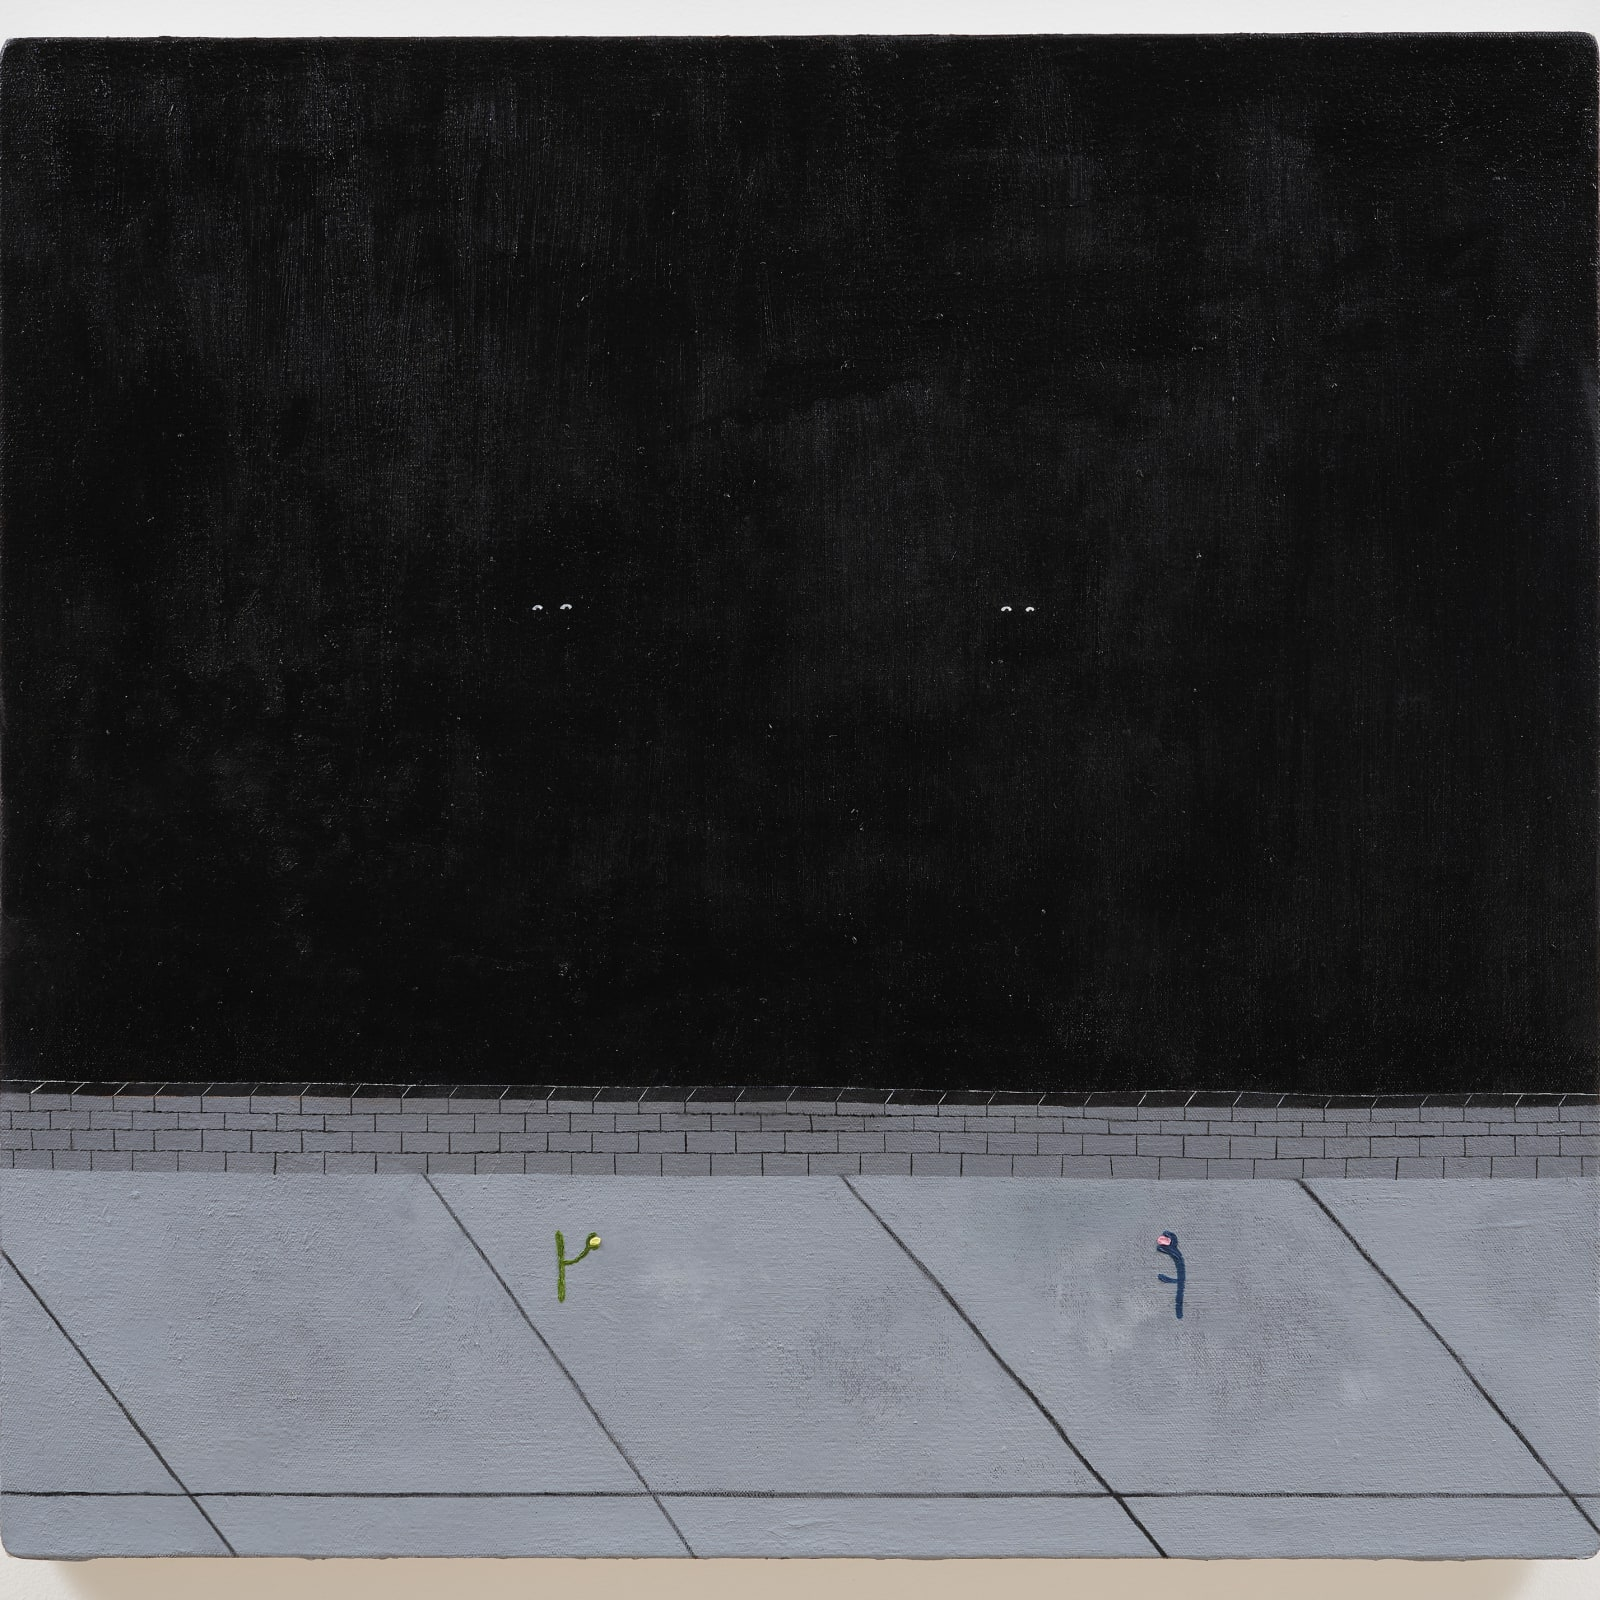 Kenny Rivero  Ancestors, 2018  Oil on canvas  24 1/2 x 25 1/4 in (62.2 x 64.1 cm)